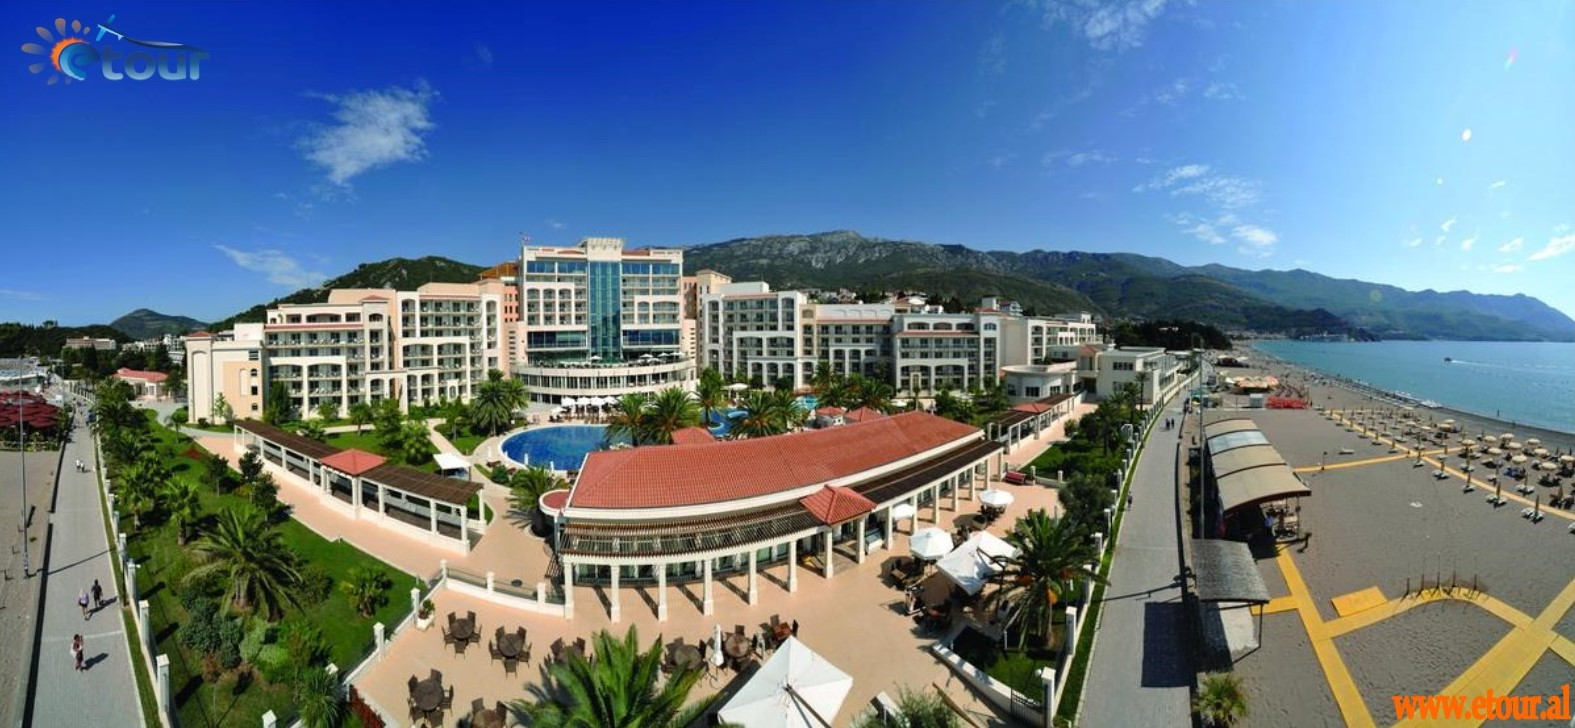 Splendid Hotel Conference & Spa Resort